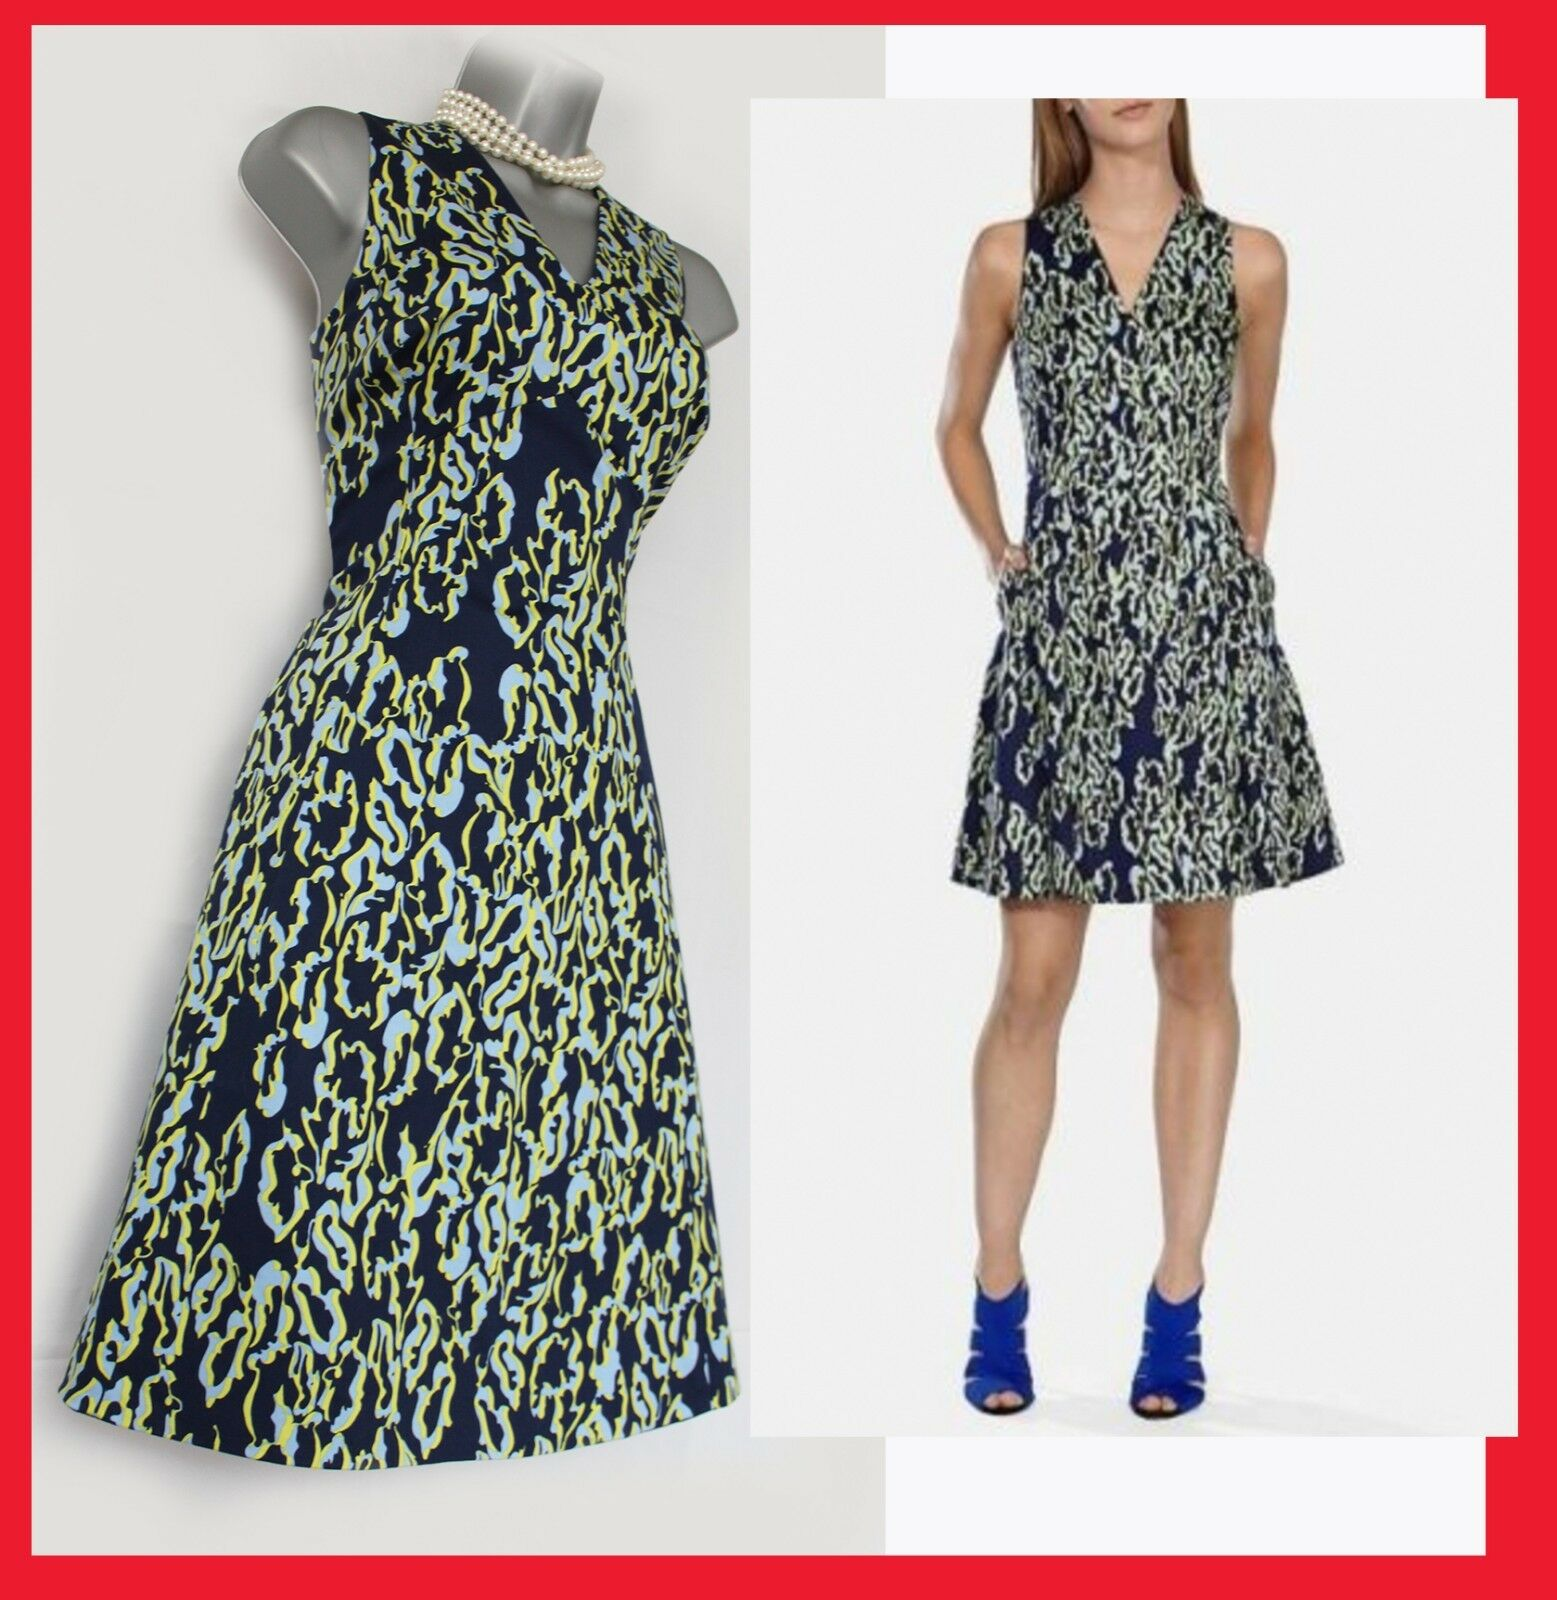 KAREN MILLEN Navy Print Cotton Side Pocket Rockabilly Casual Party Dress UK10 38